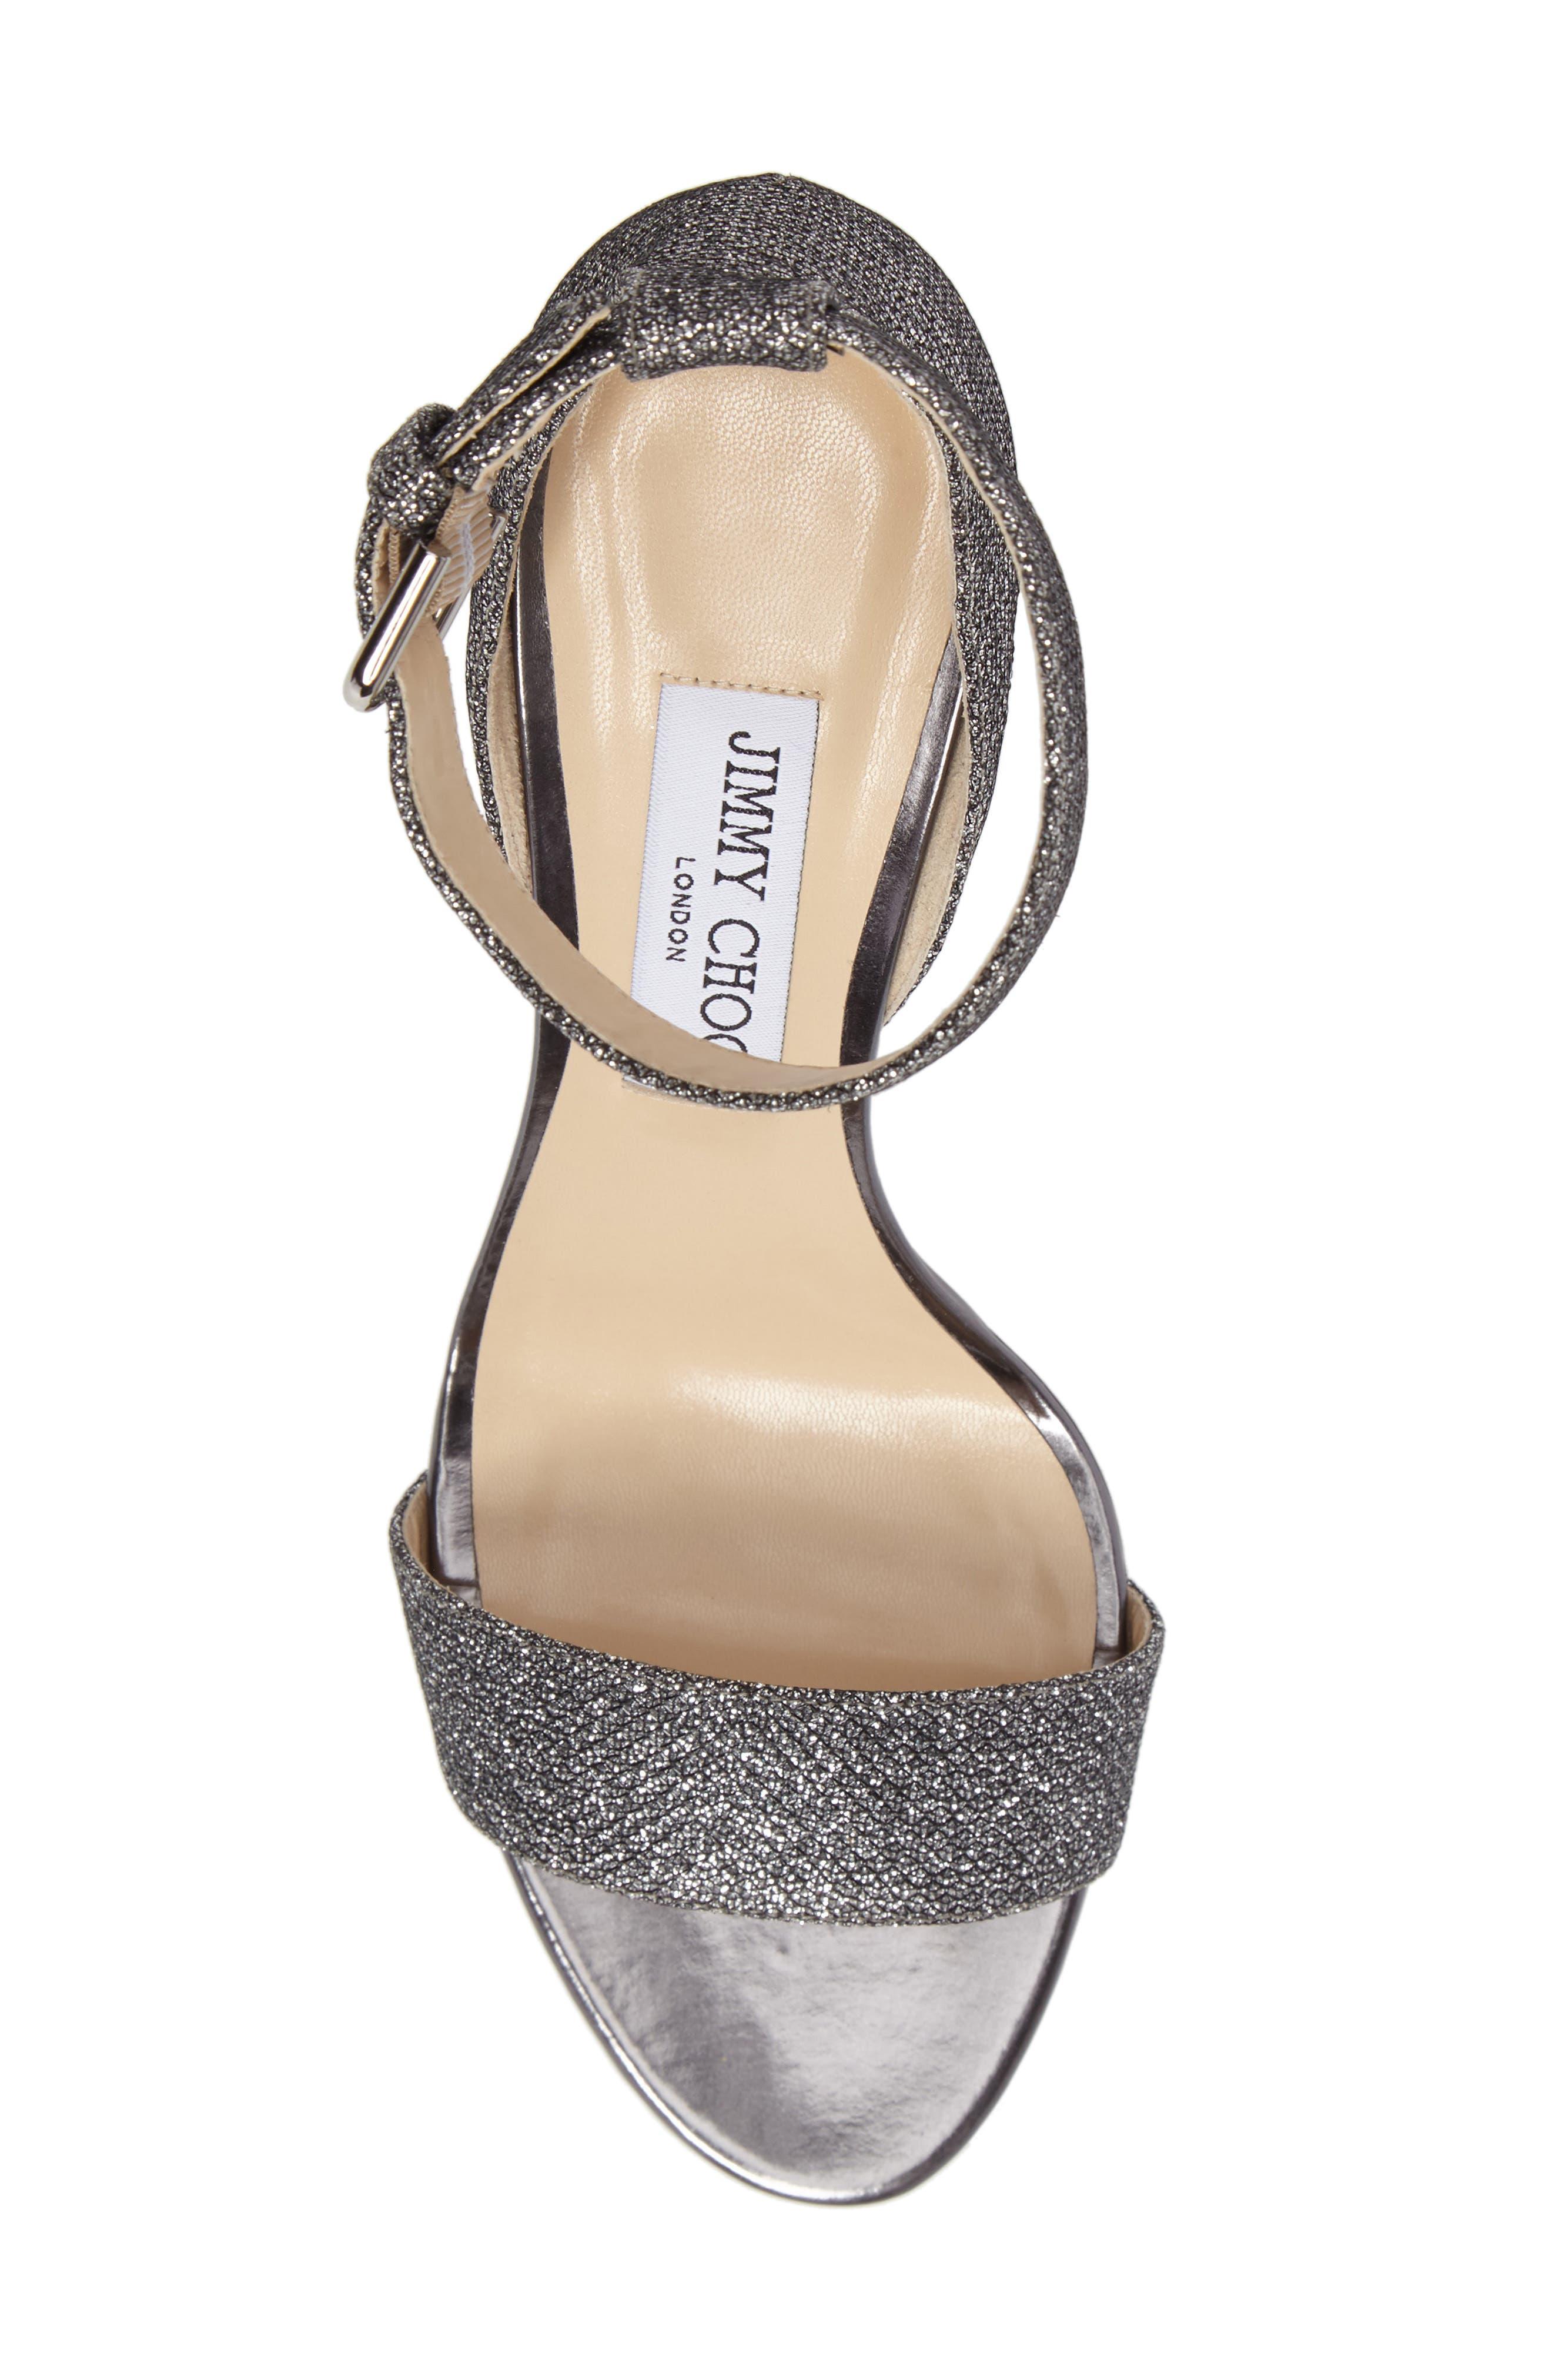 Edina Ankle Strap Sandal,                             Alternate thumbnail 5, color,                             Anthracite